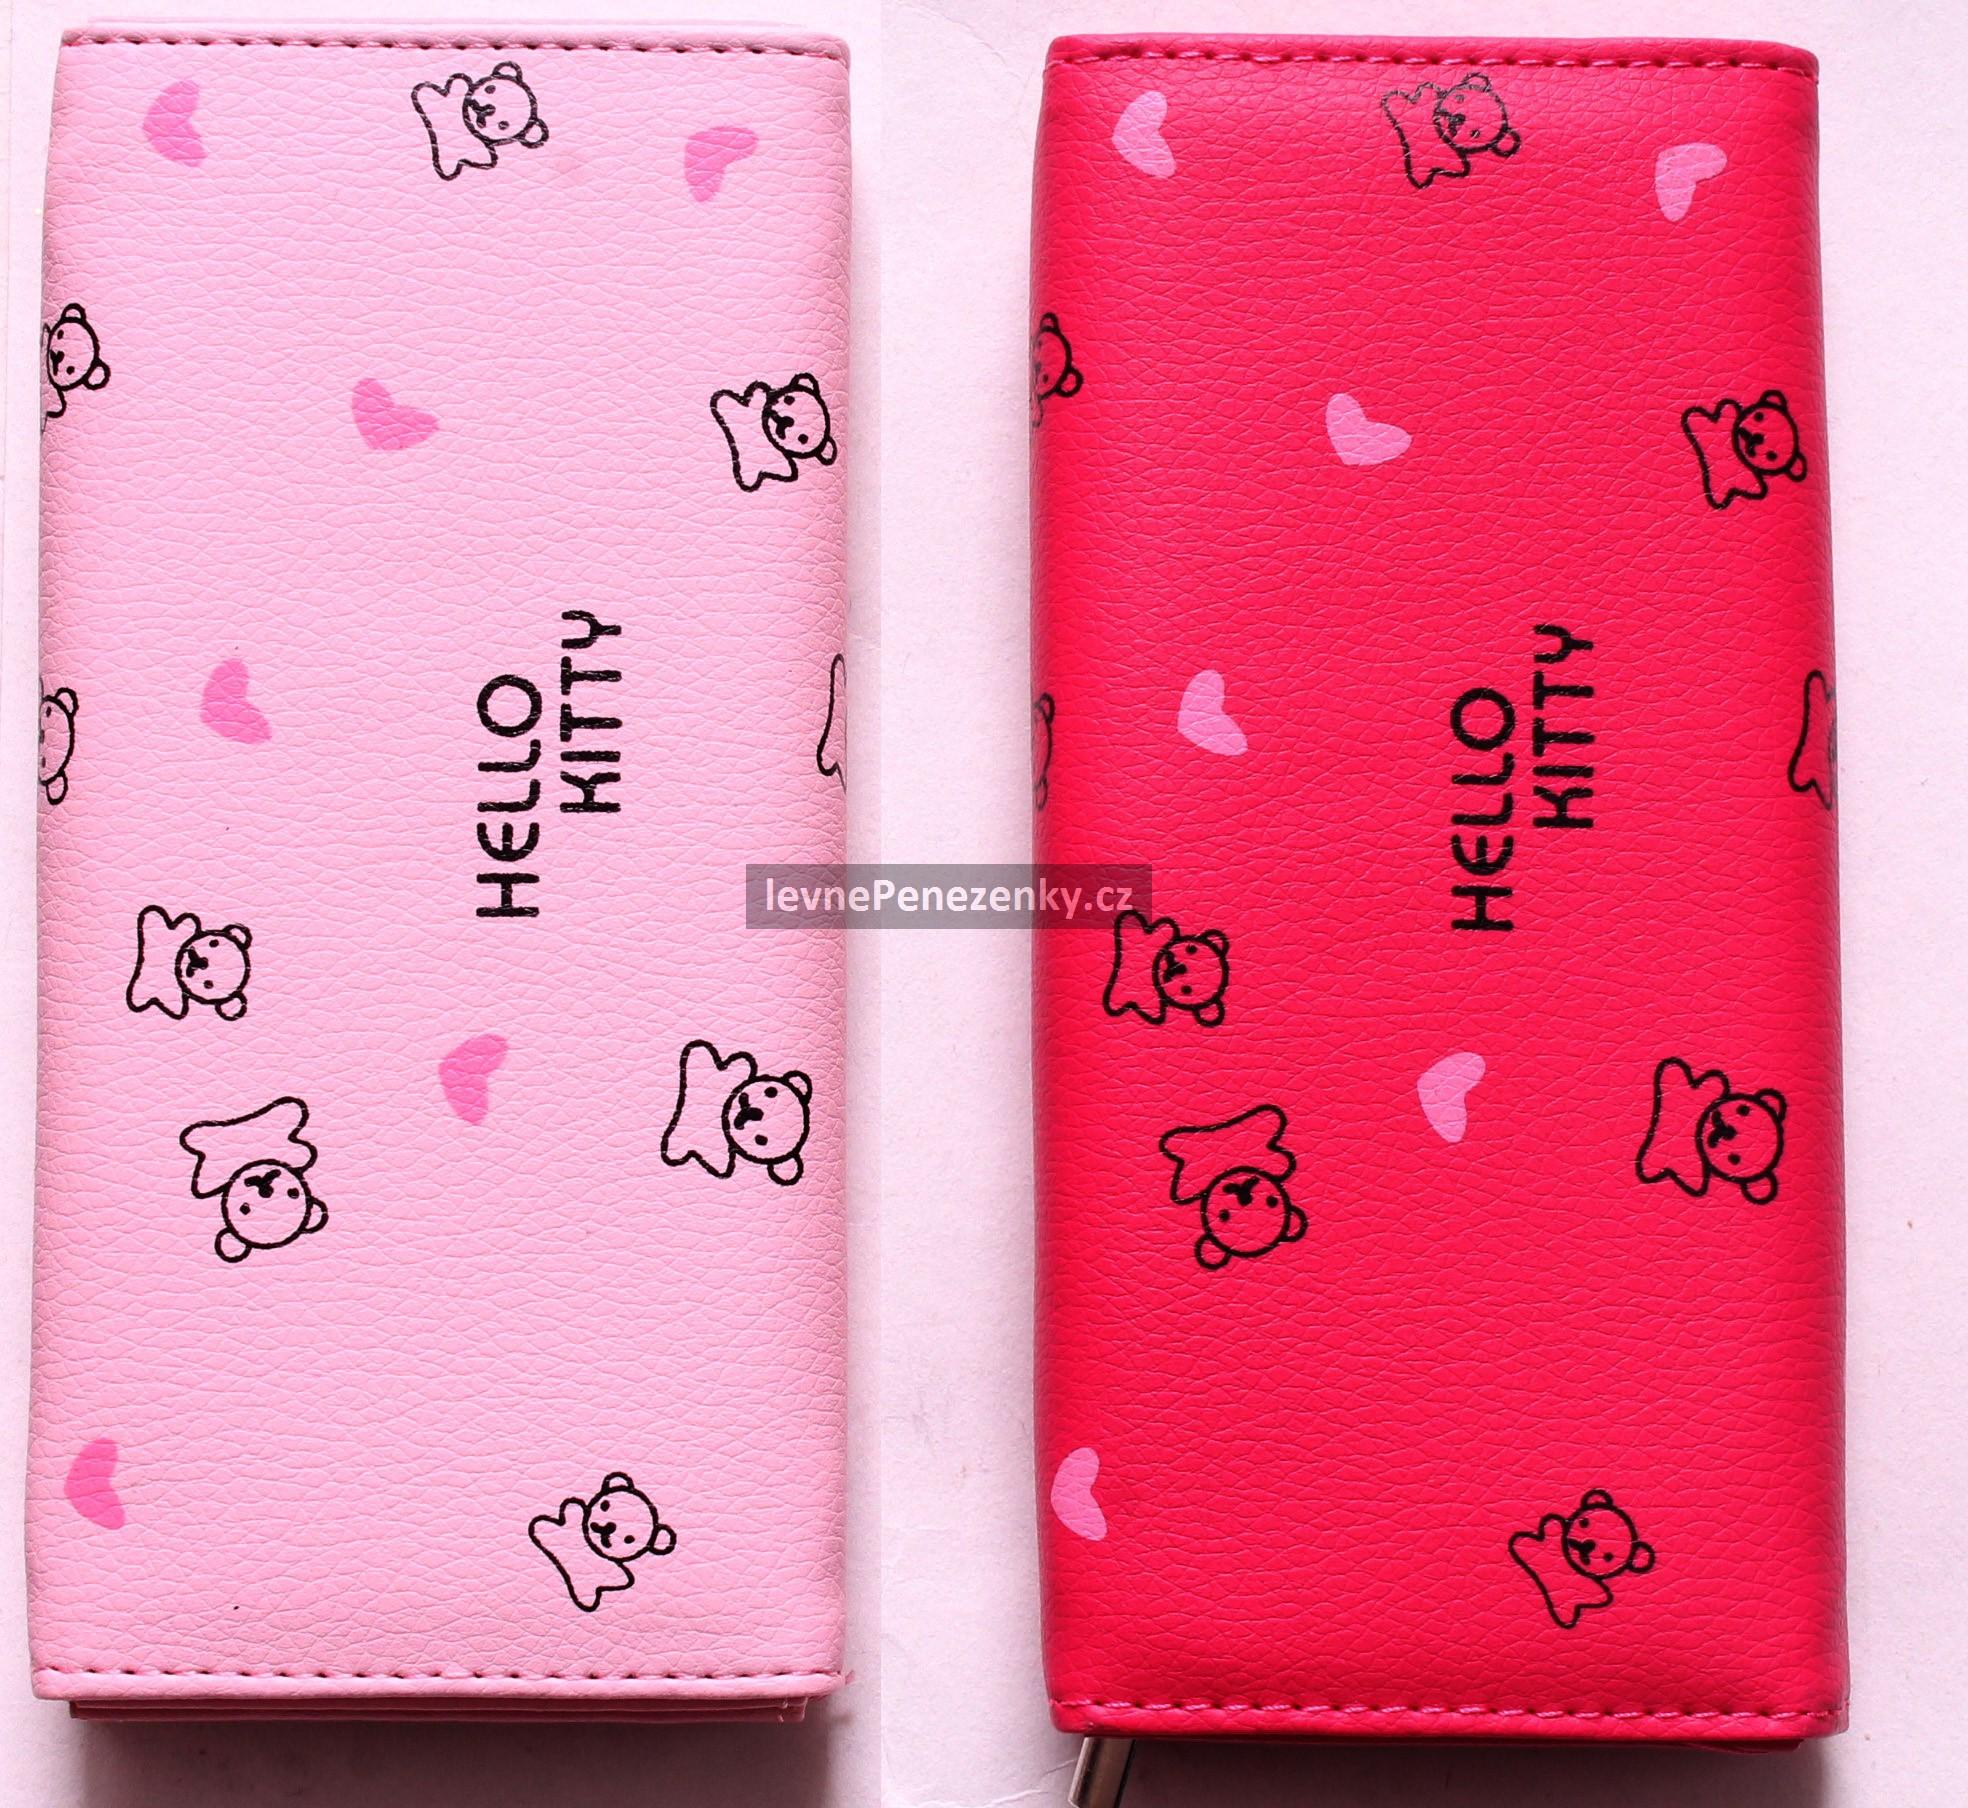 bfb784b0db Luxusná peňaženka Hello Kitty - 3 farby